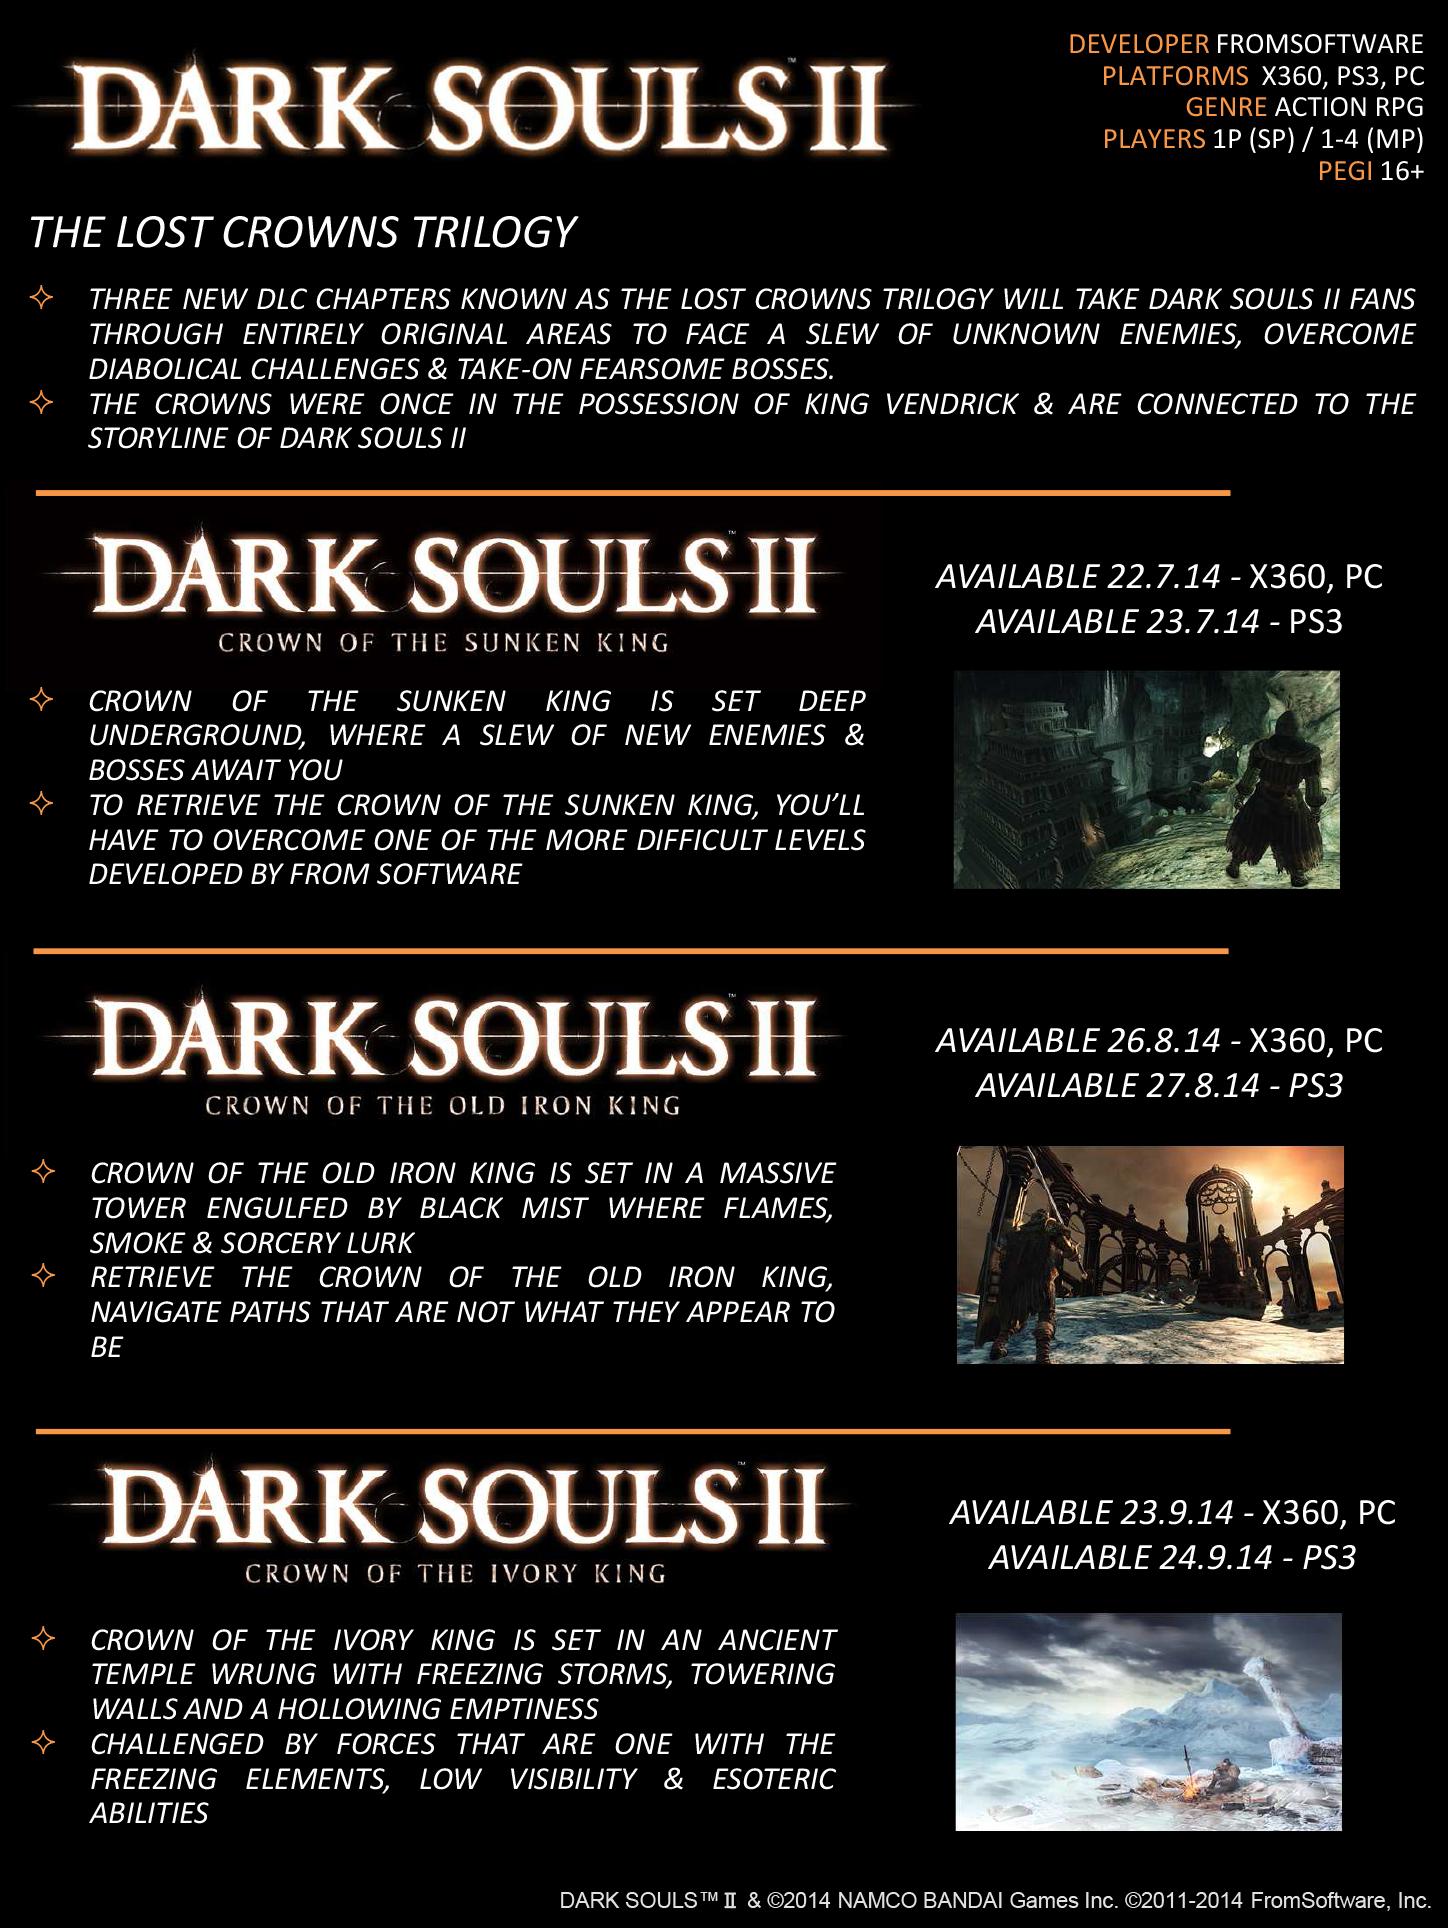 Dark Sousl 2 trilogia dlc